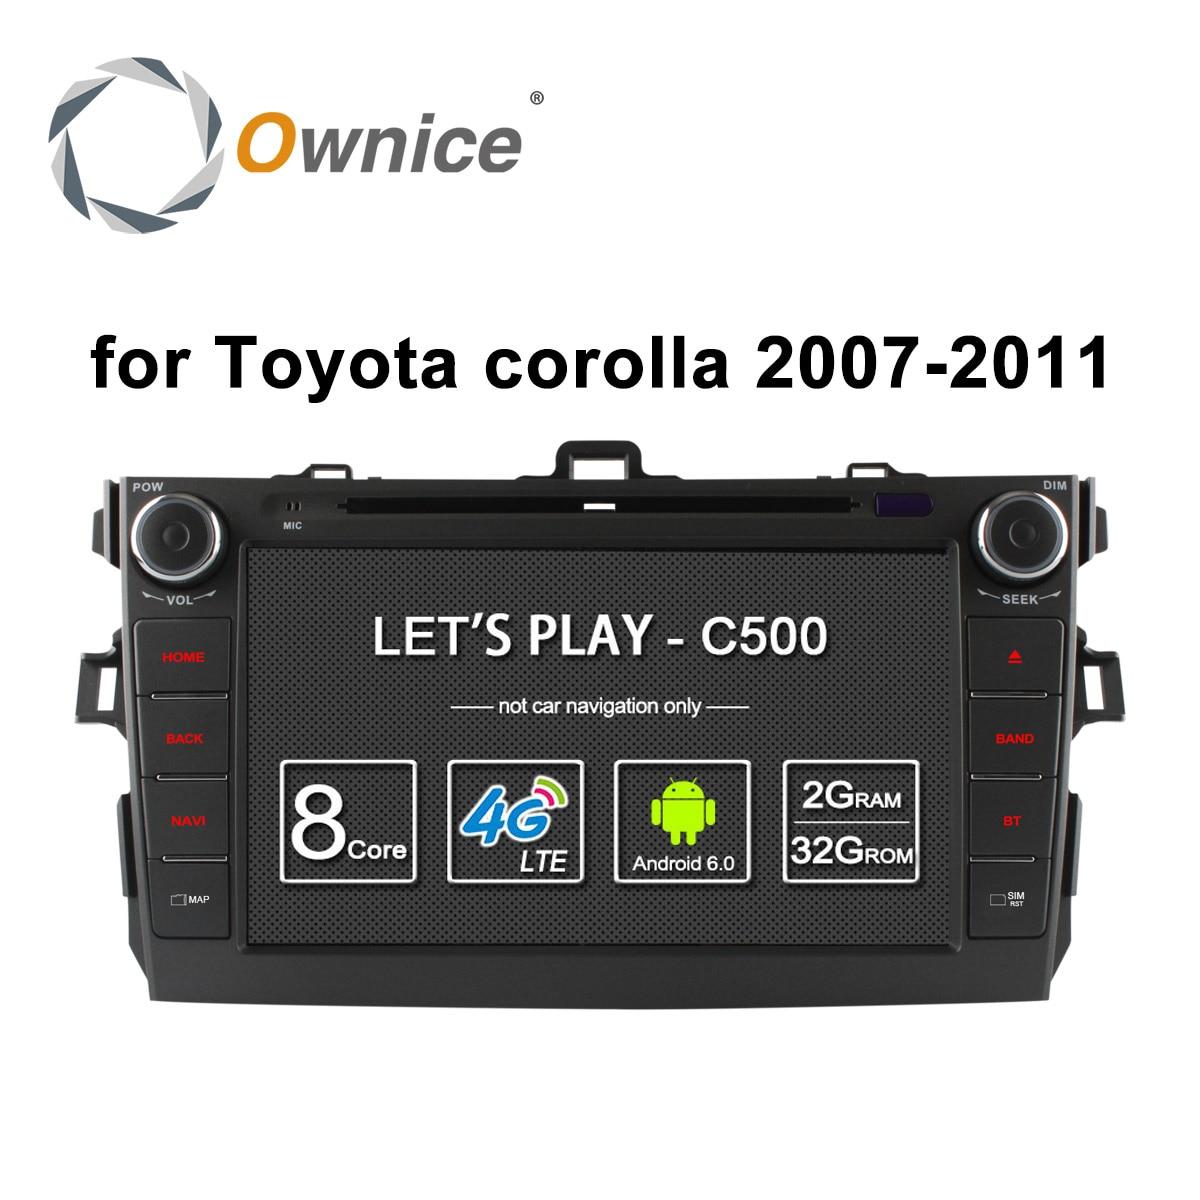 Ownice C500 Android 6,0 Octa 8 Core 2G RAM Автомобильный dvd плеер для Toyota corolla 2007 - 2011 in dash 2 din gps navi 4G LTE сеть